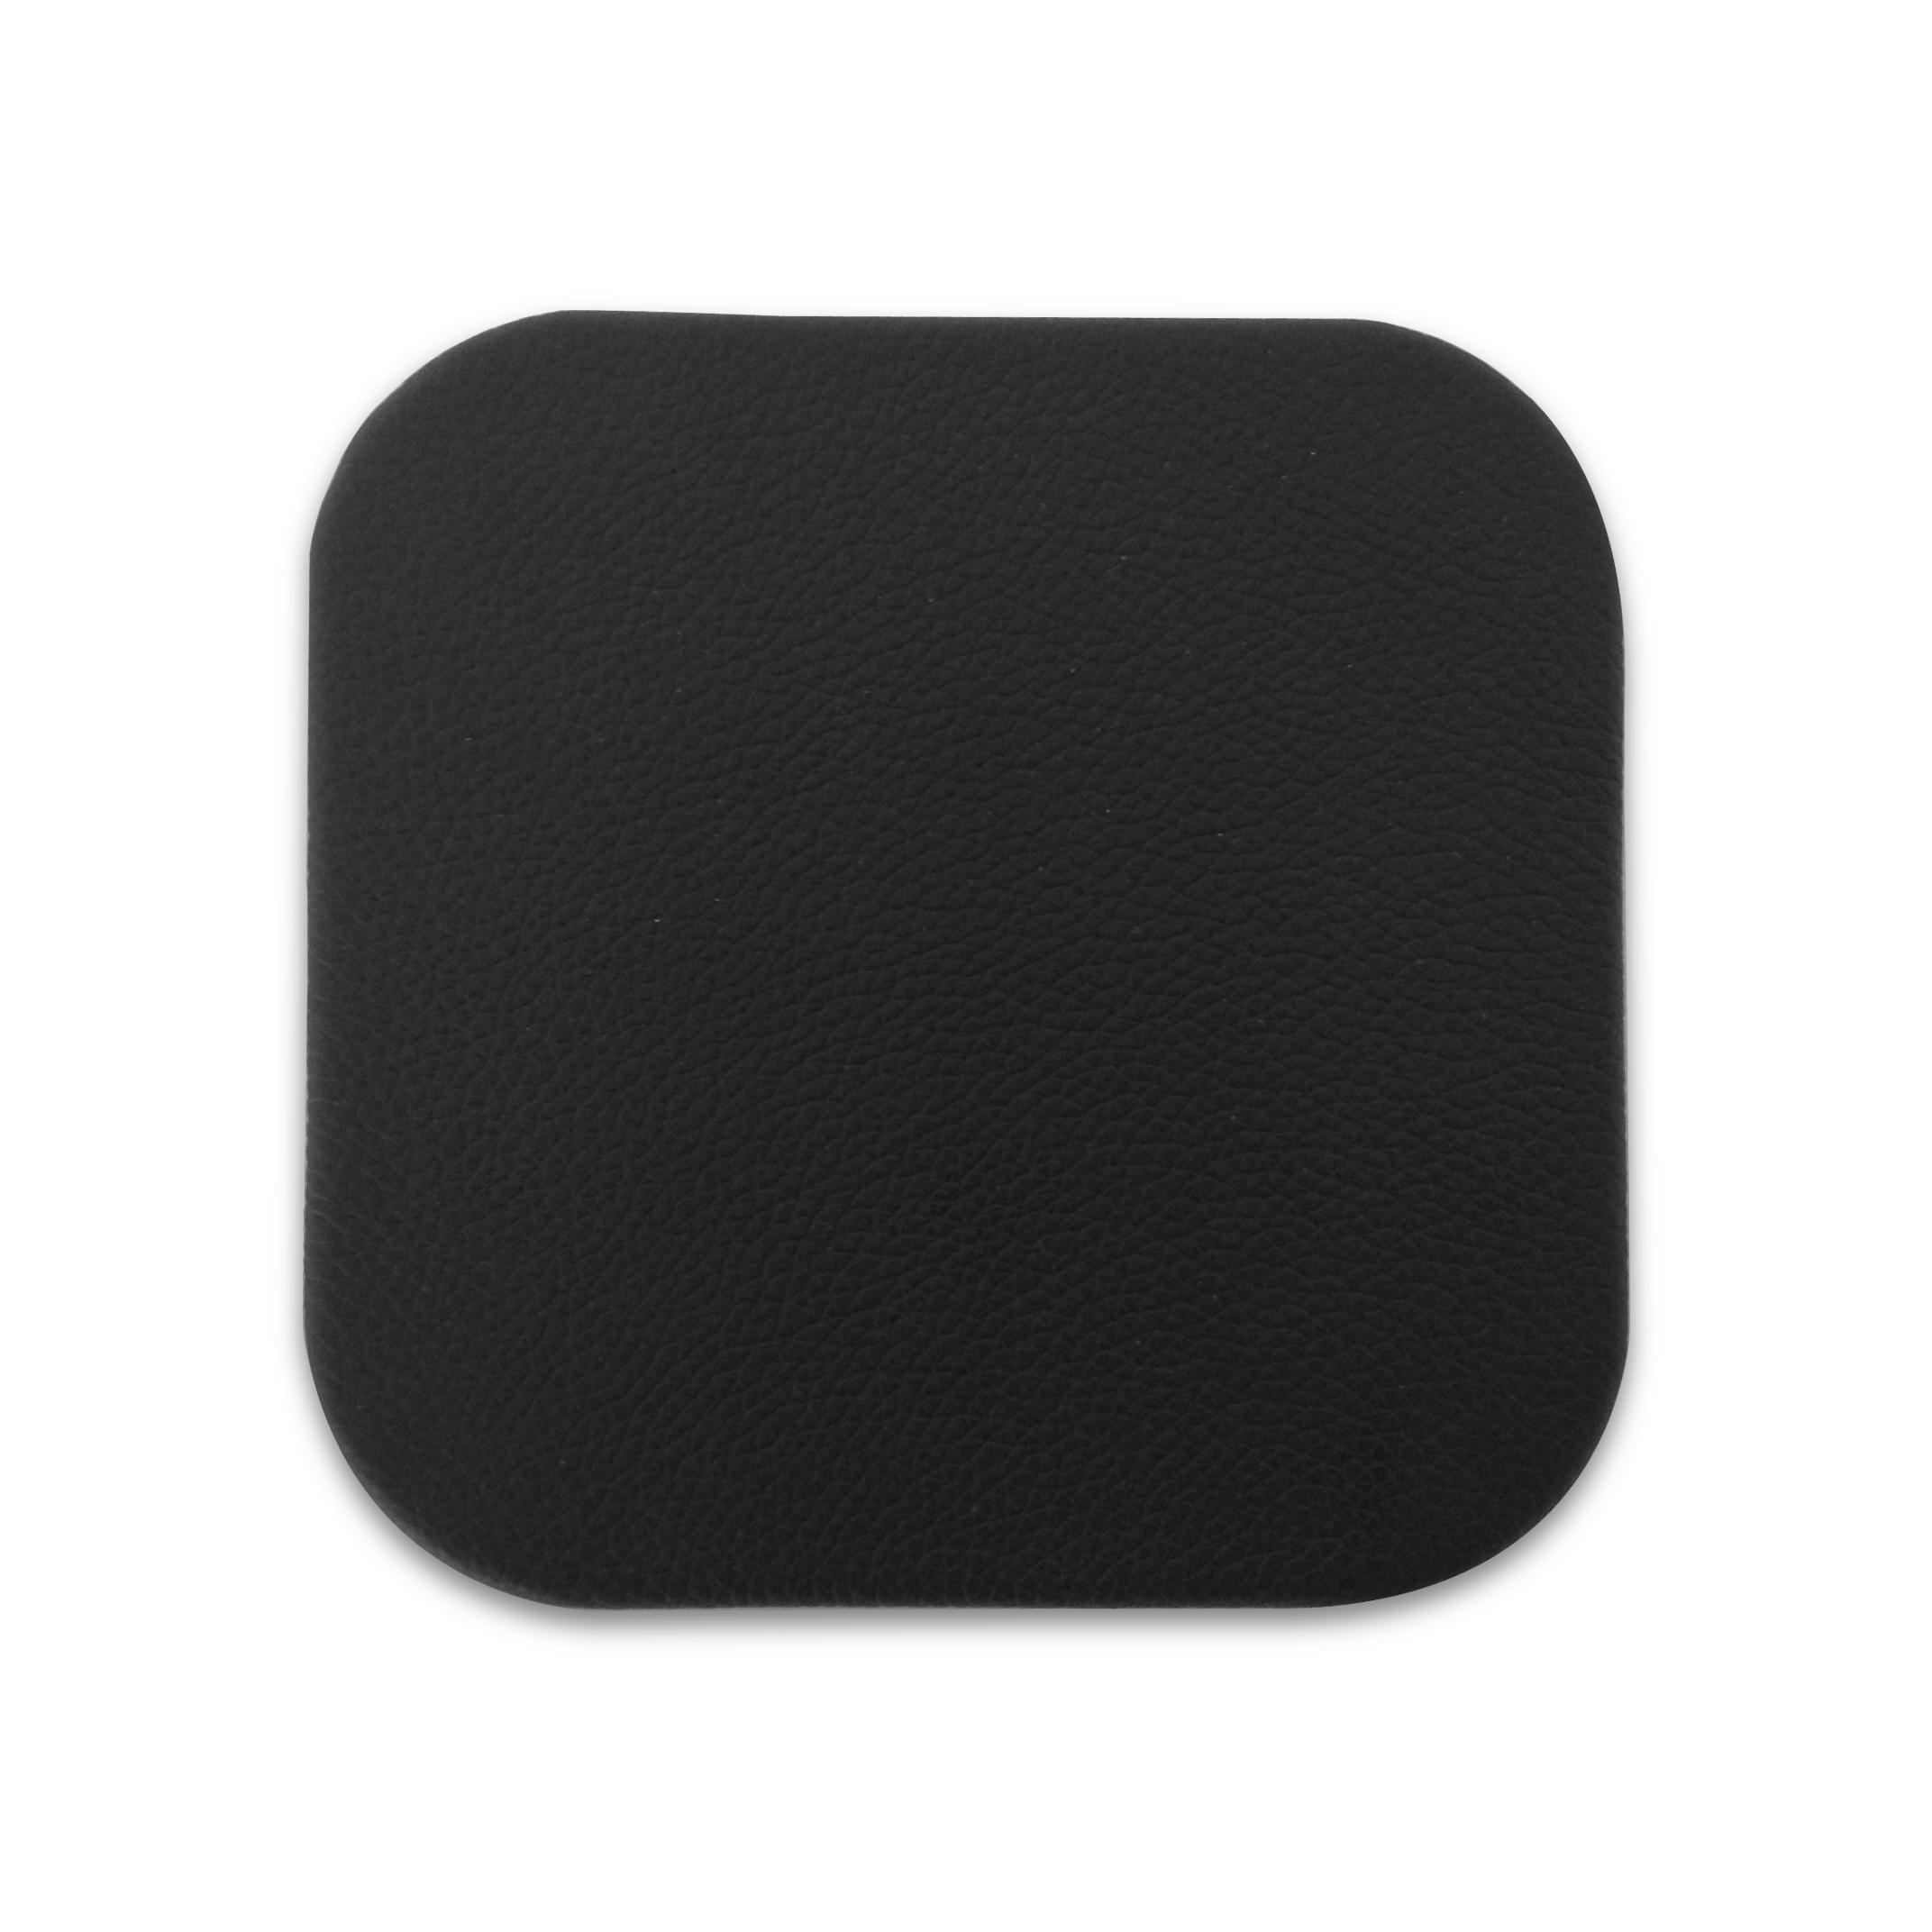 Black leather coaster